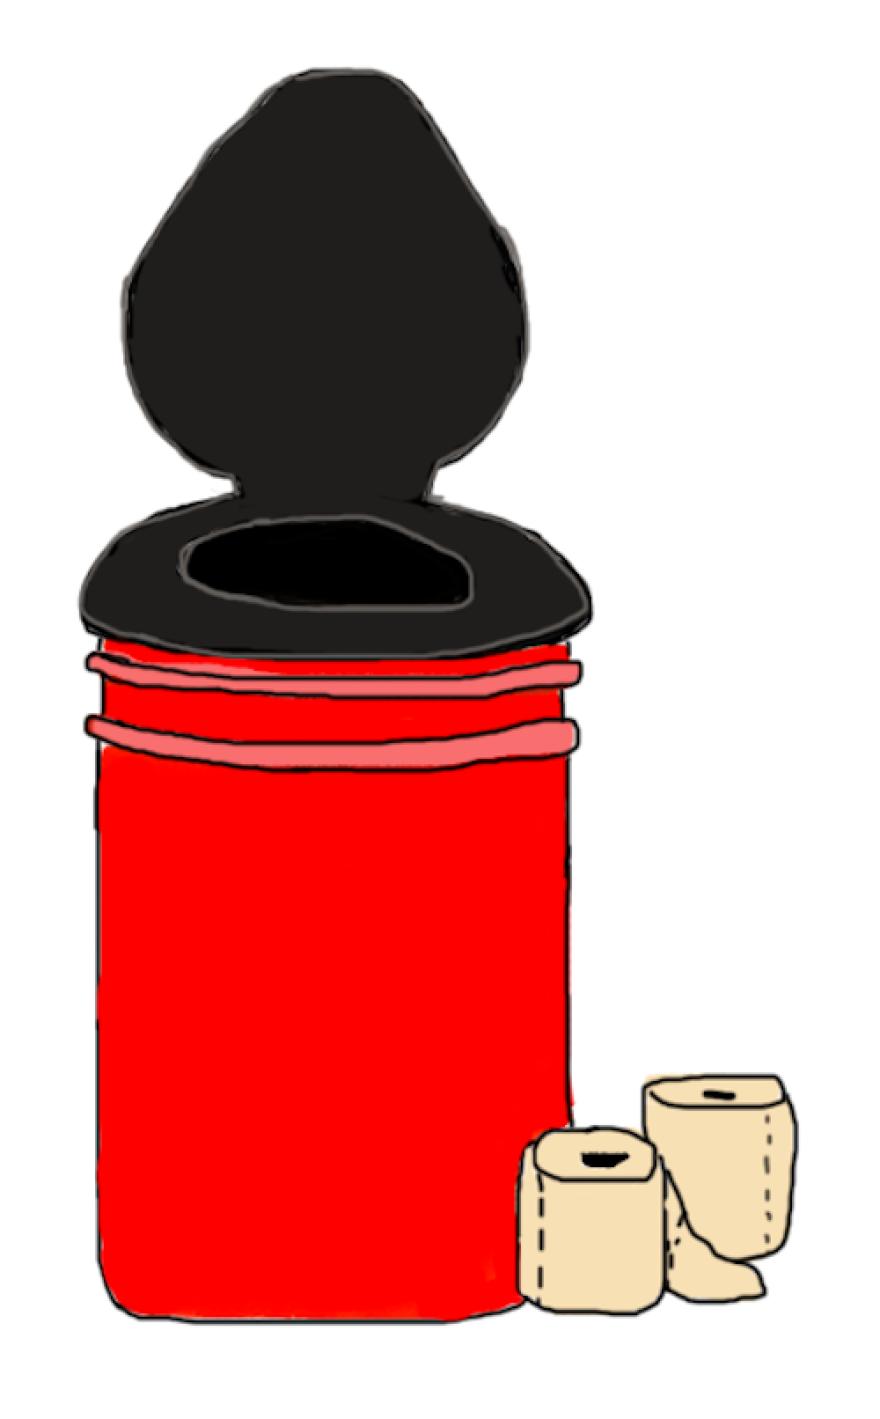 Lockdown-toilet-illo-ab-wunc-05060219.png